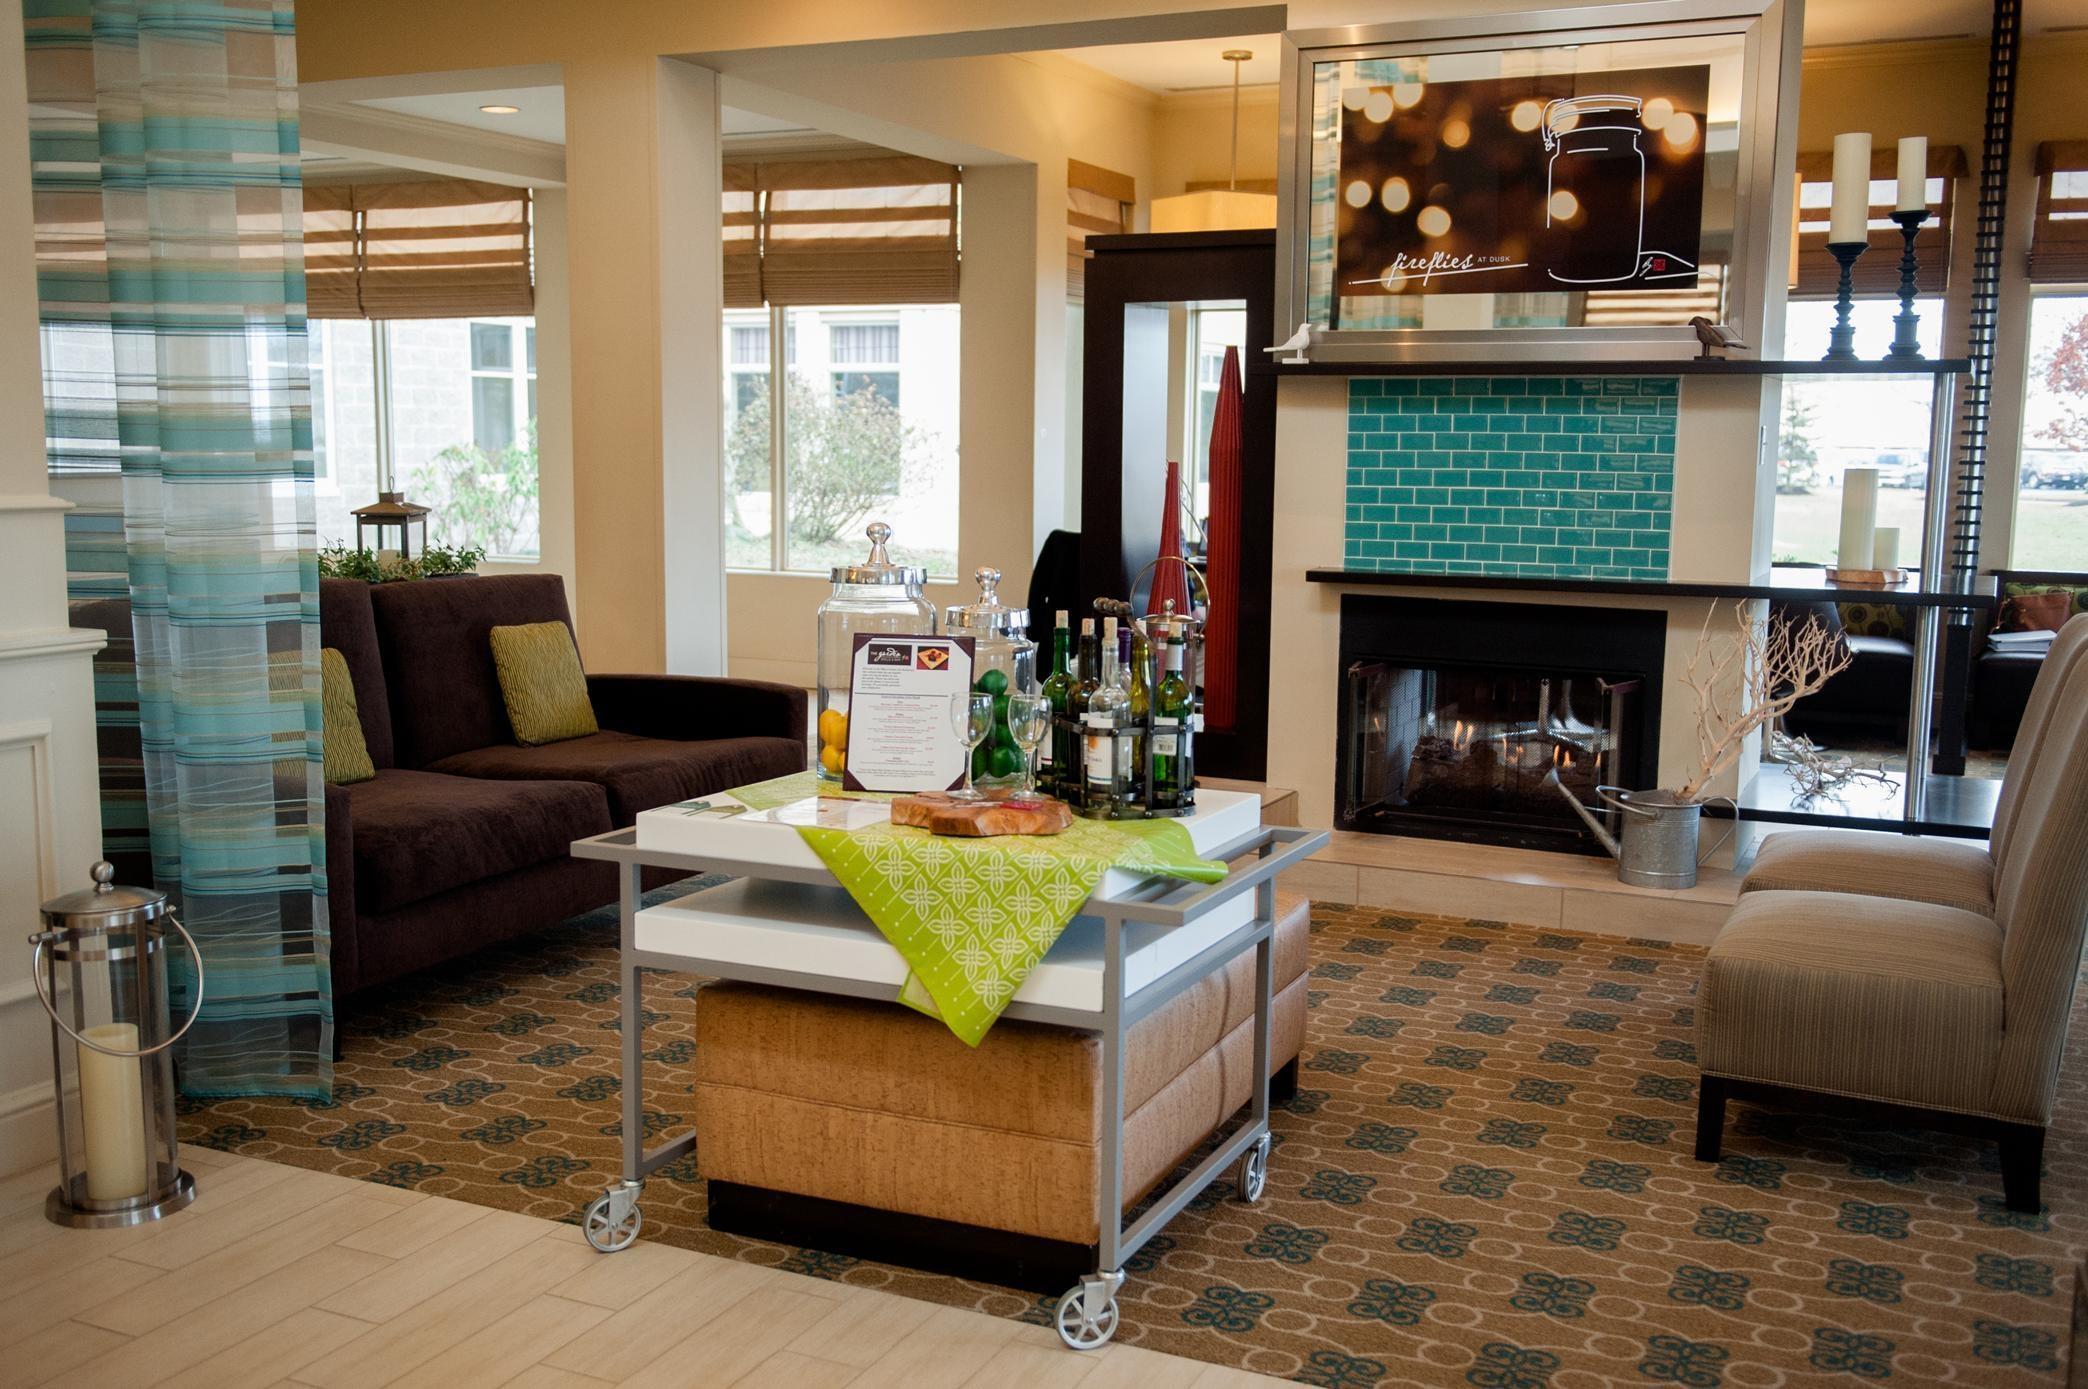 Hilton Garden Inn Rockaway image 1